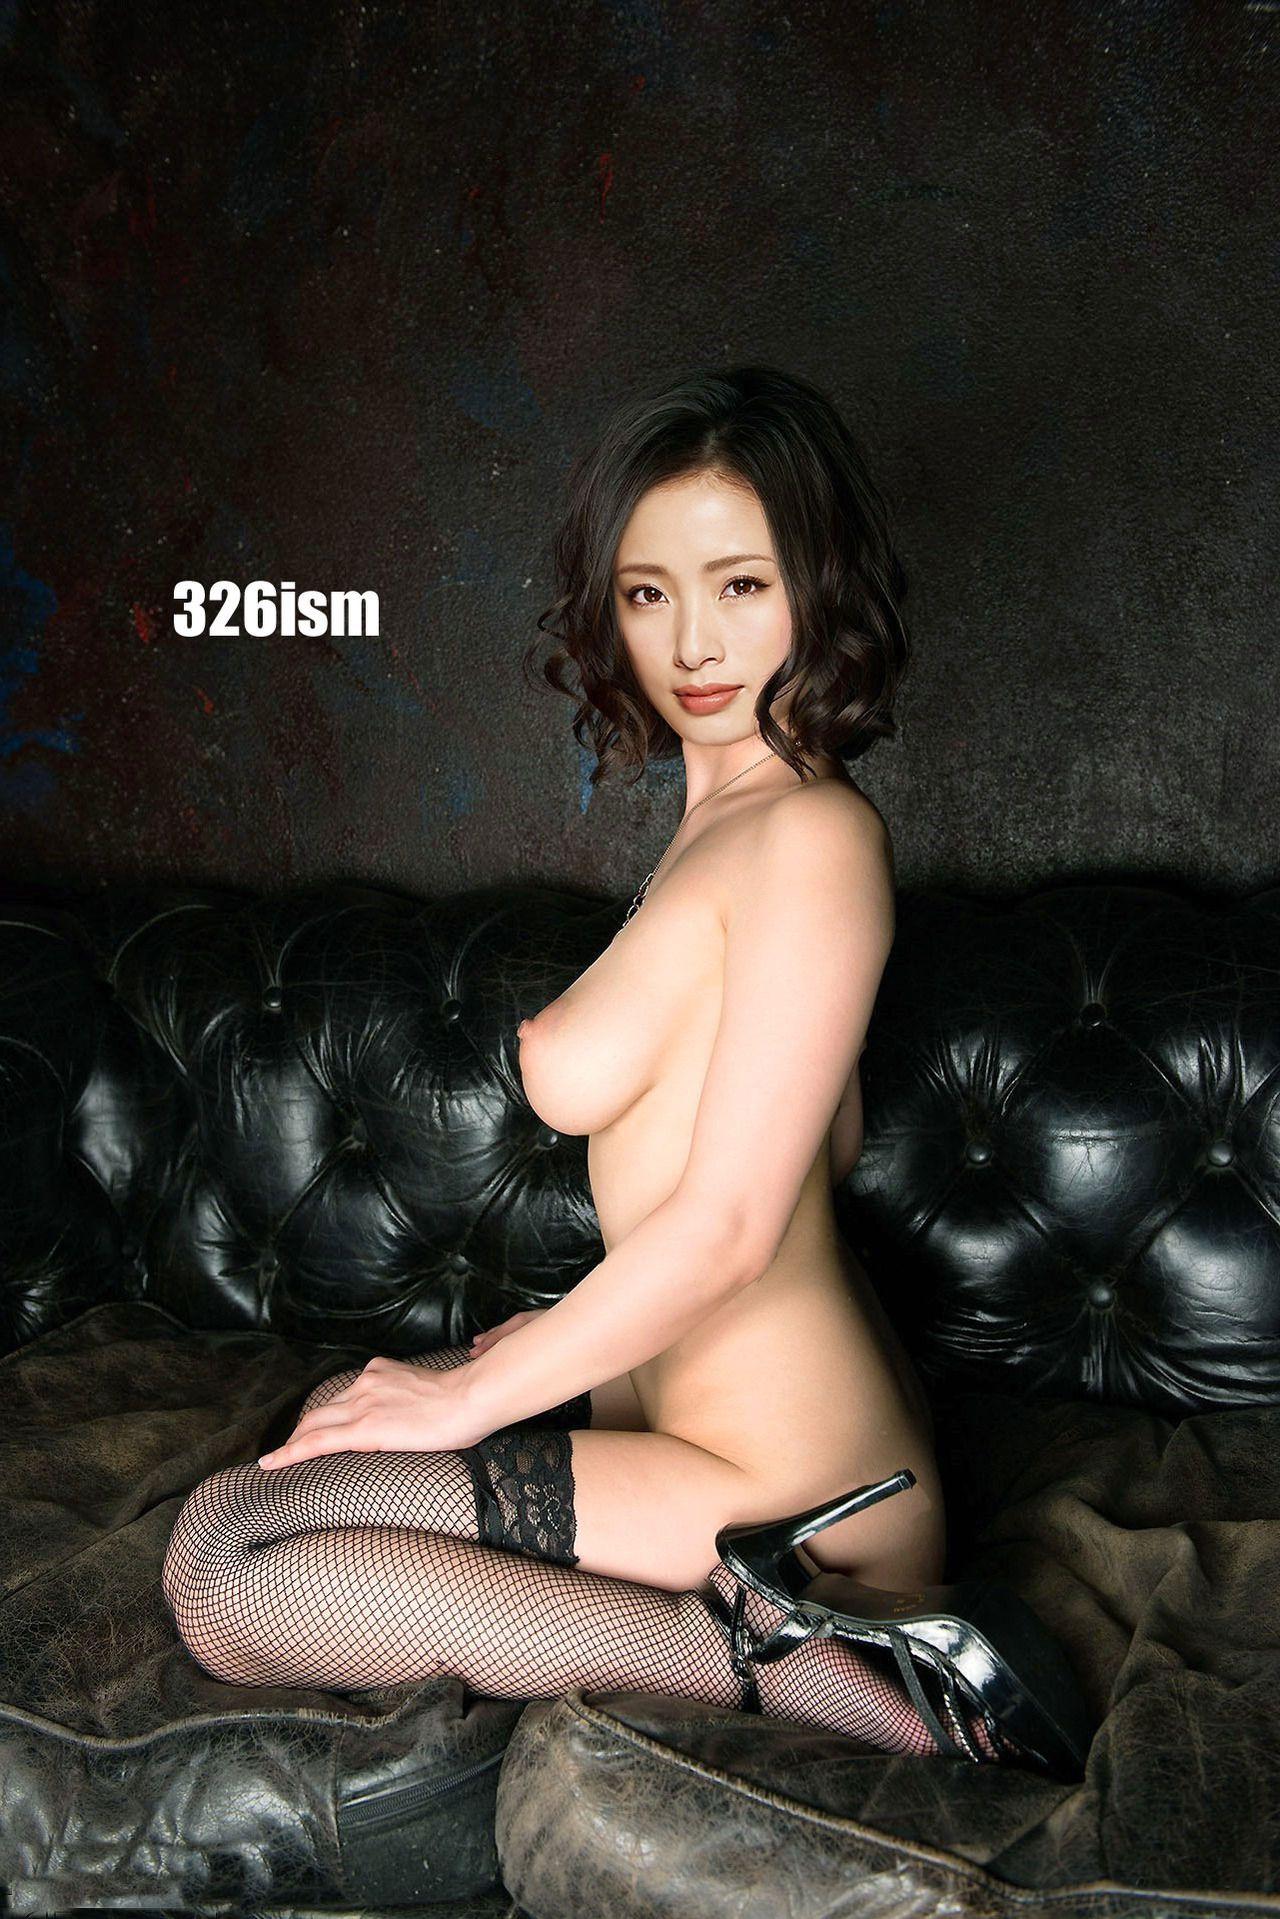 326ism アイコラ terui